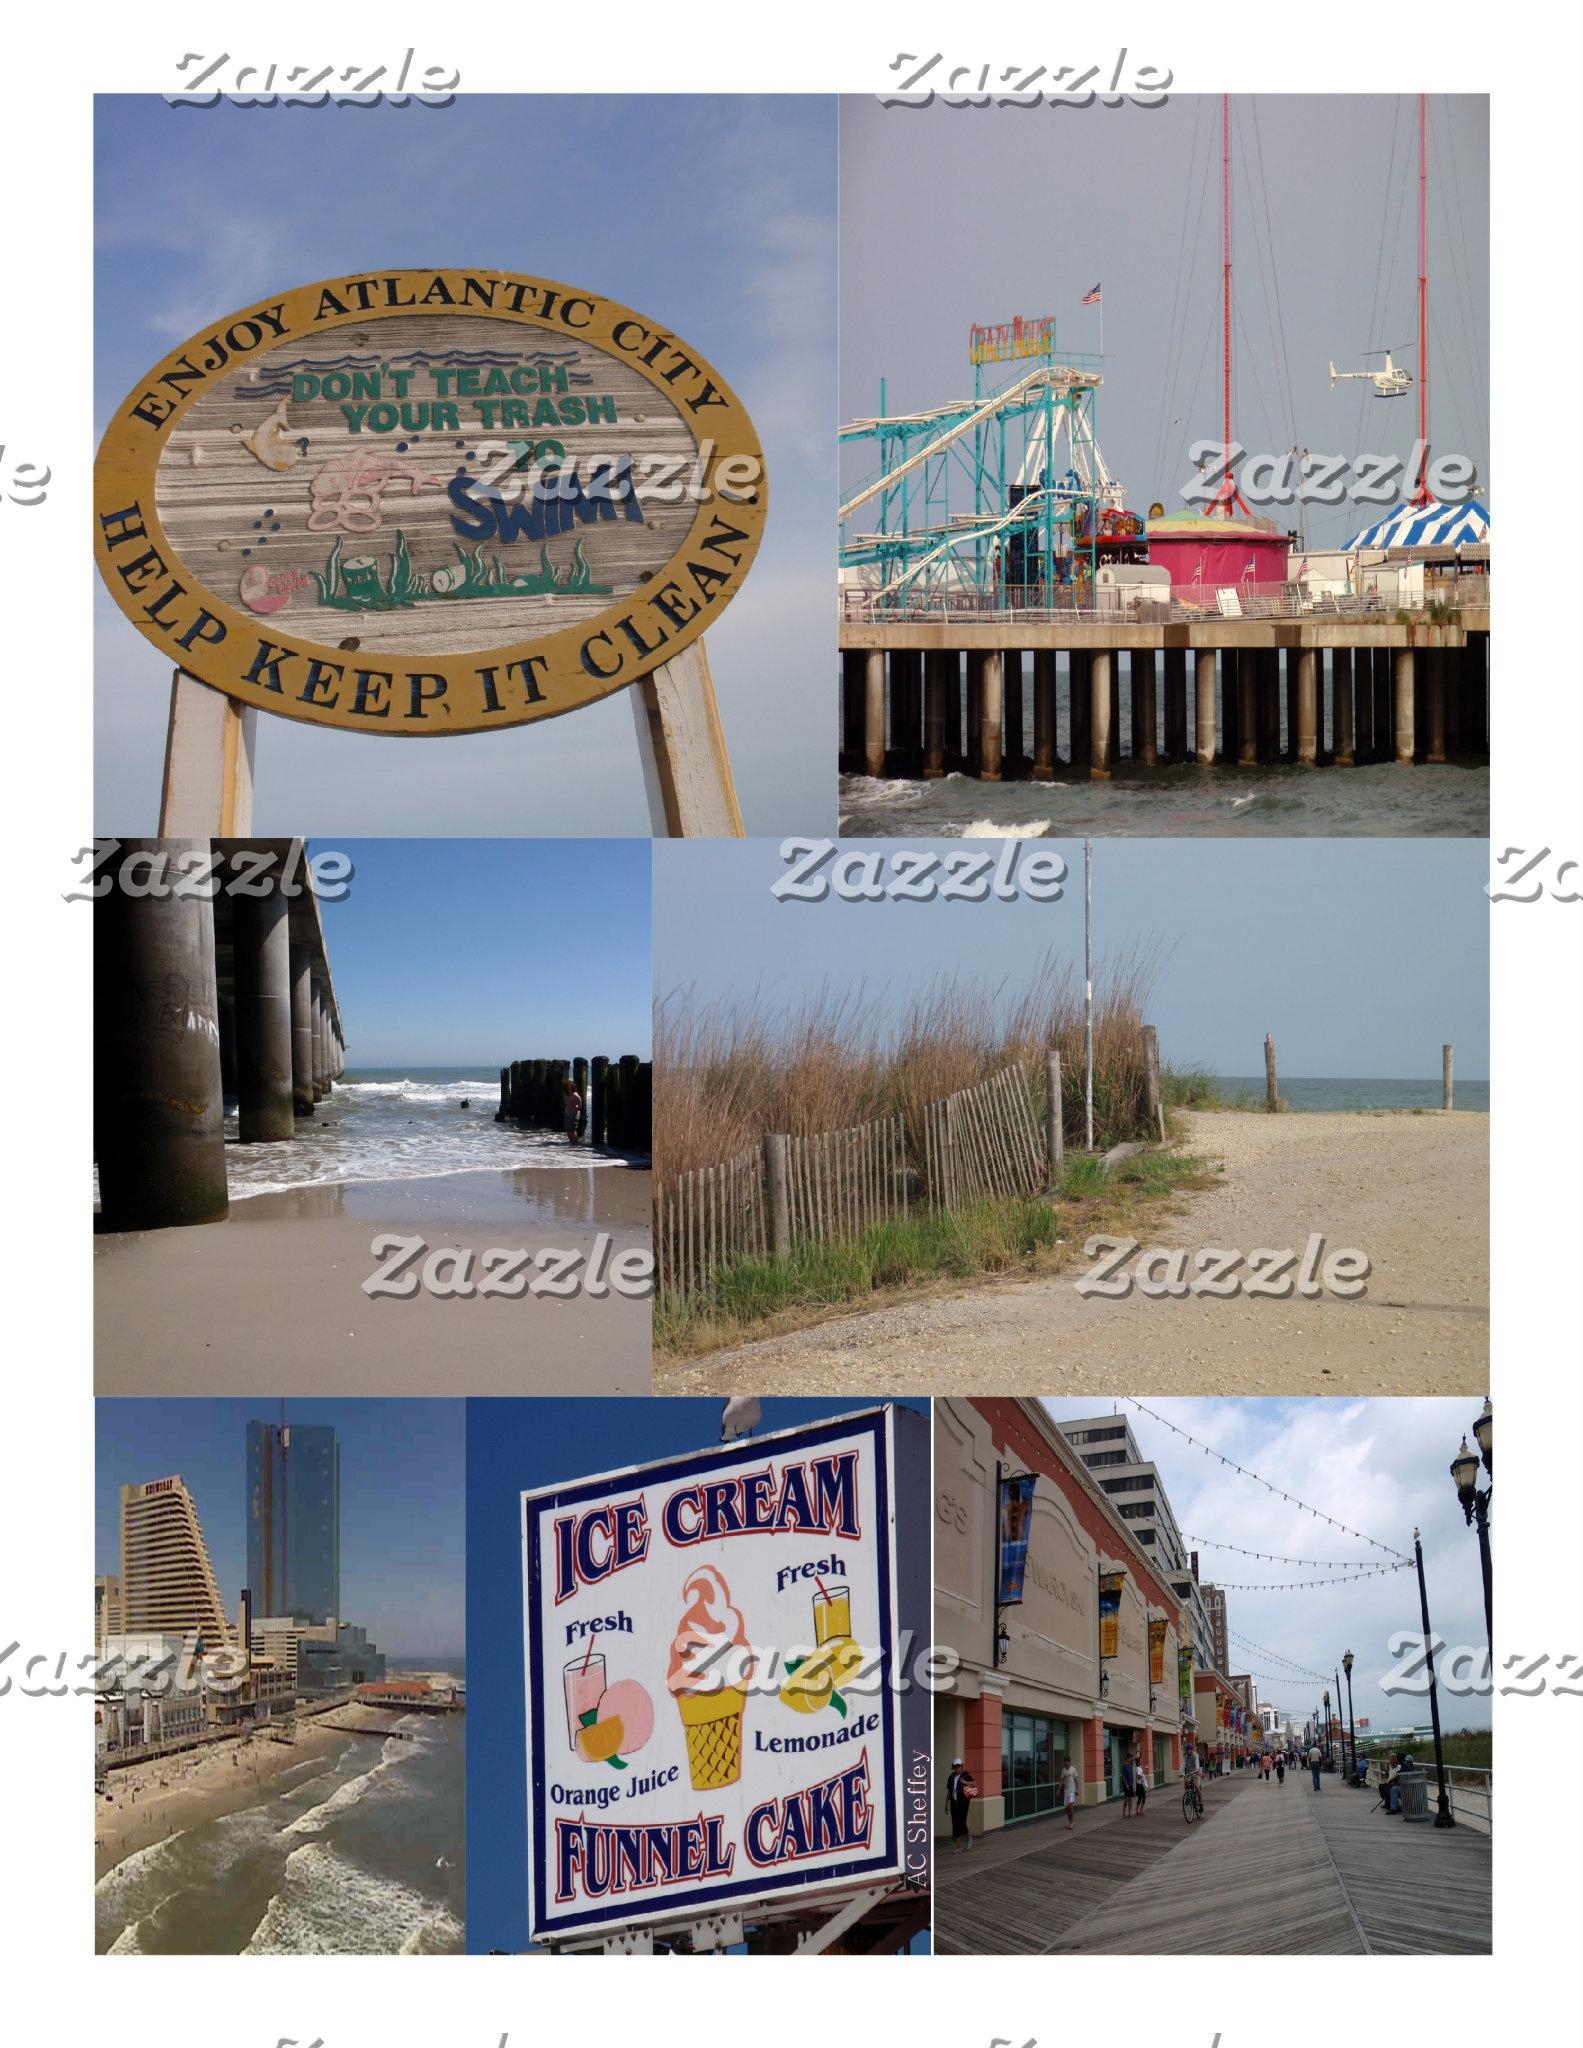 Atlantic City Boardwalk Photos